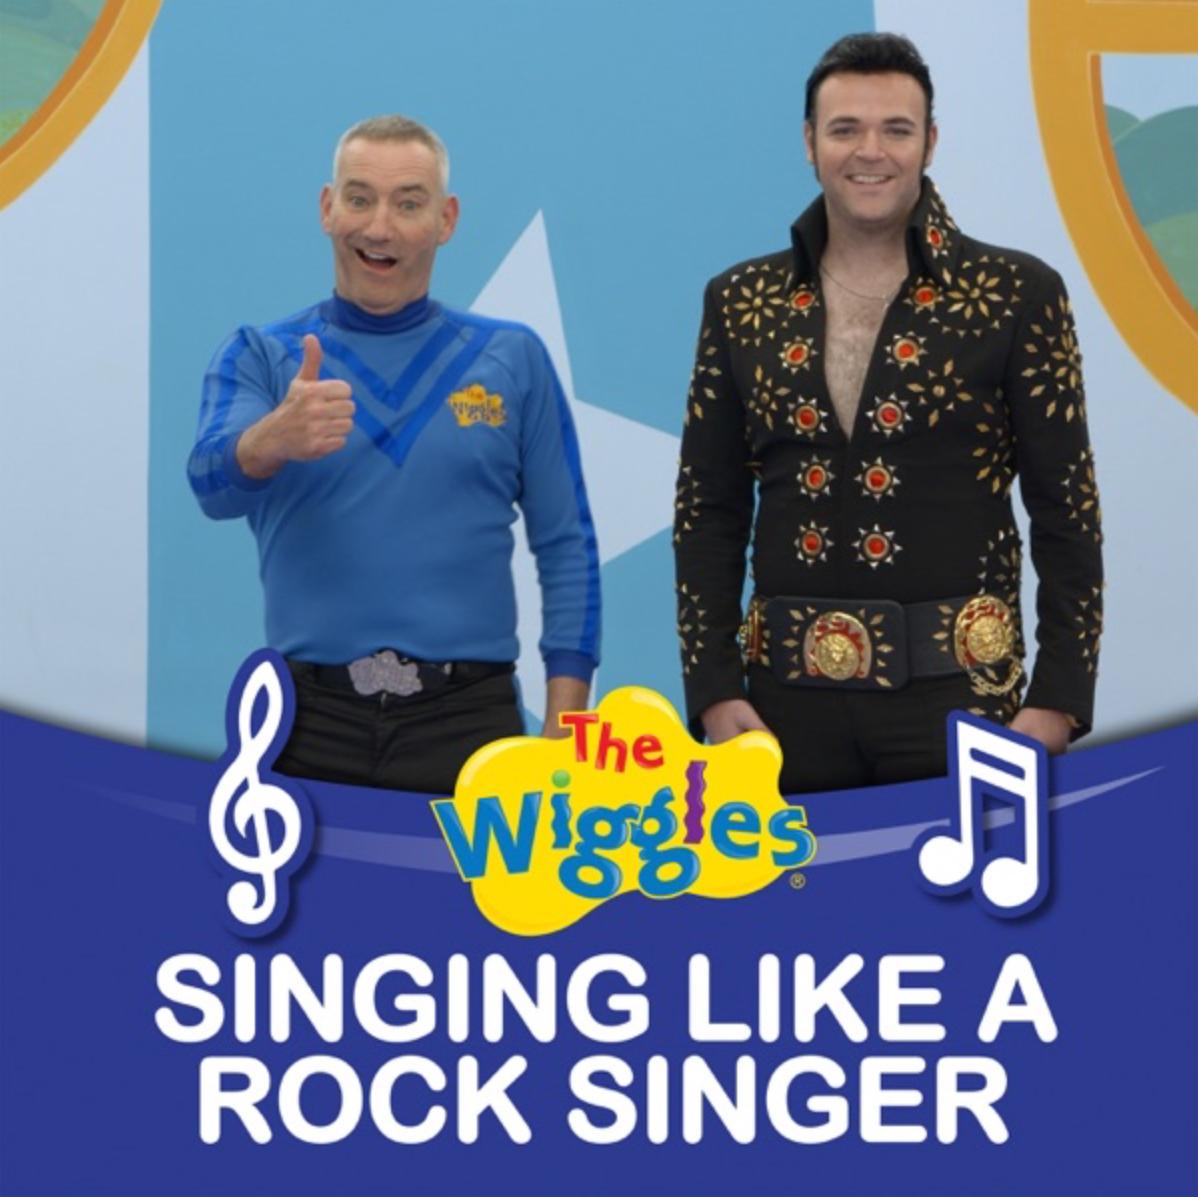 Singing Like A Rock Singer (single)